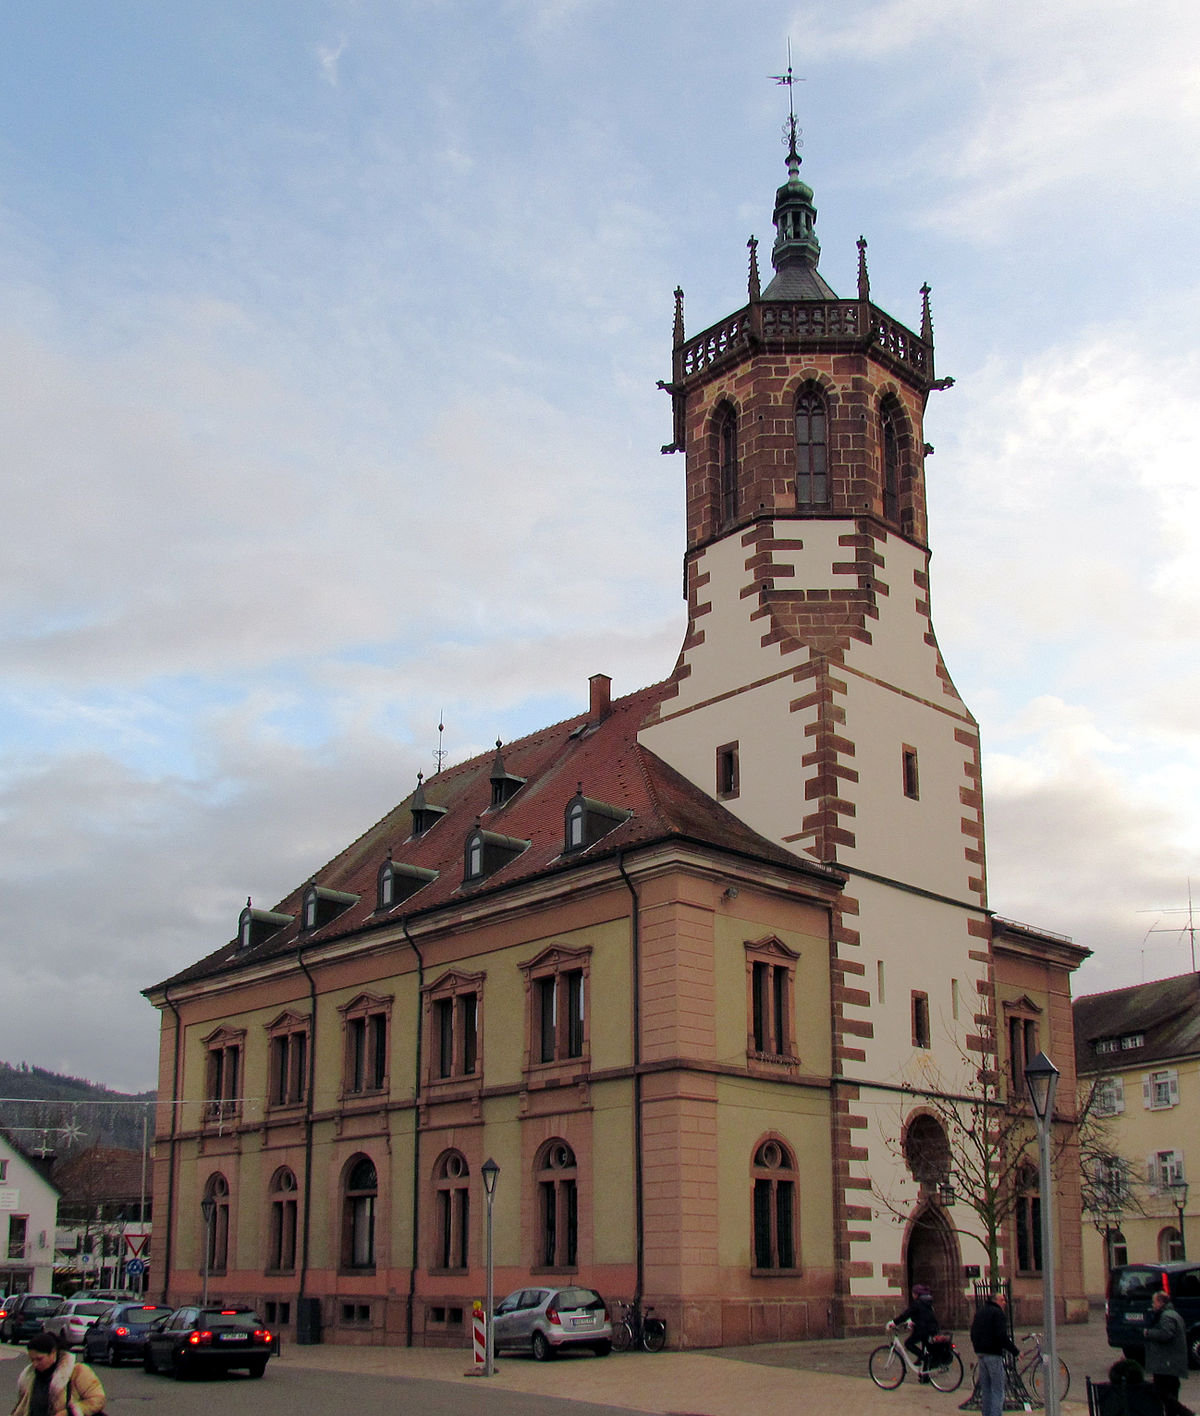 Bühl Rathaus